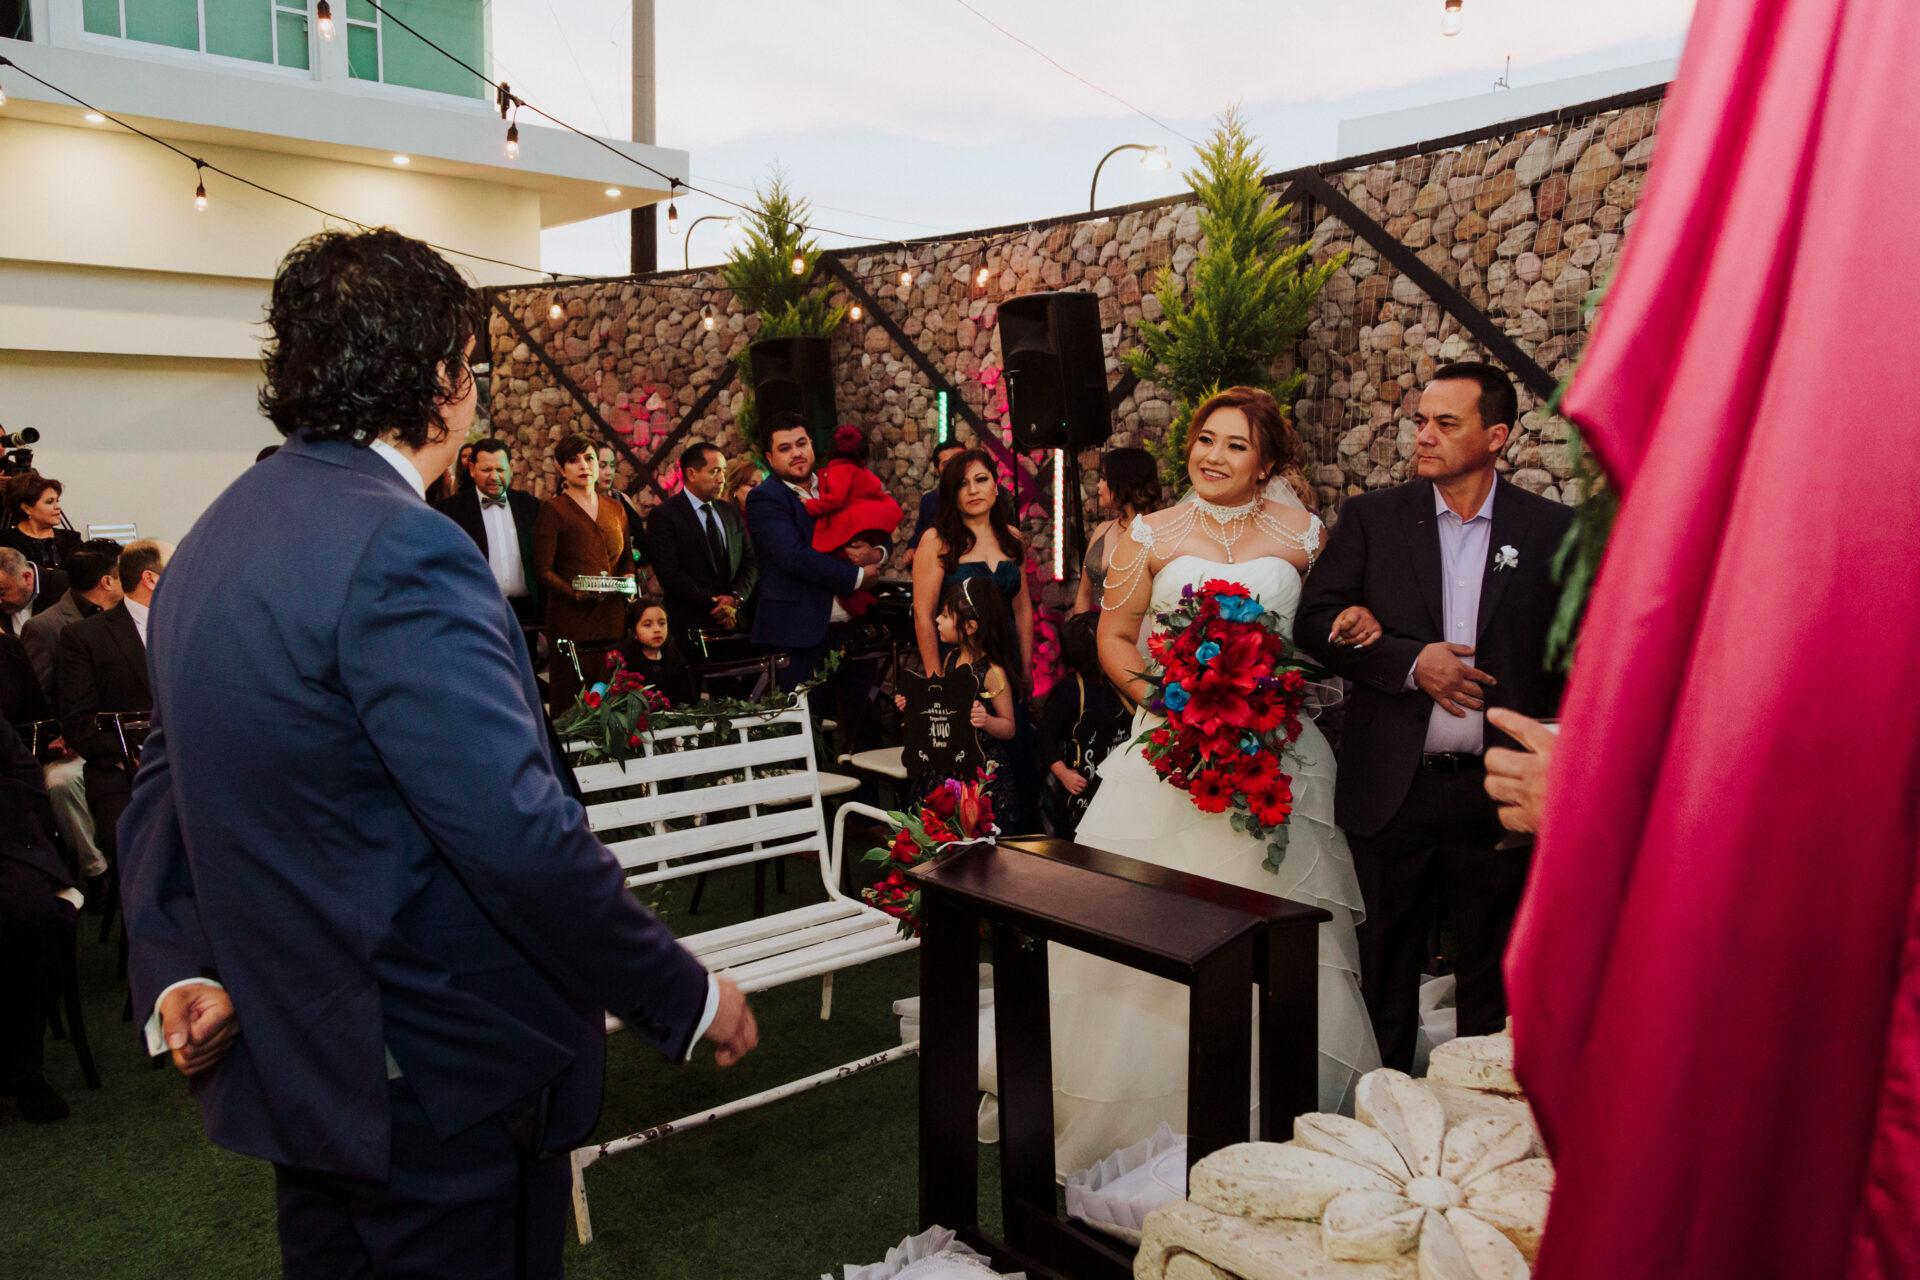 javier_noriega_fotografo_bodas_gaviones_zacatecas_wedding_photographer25